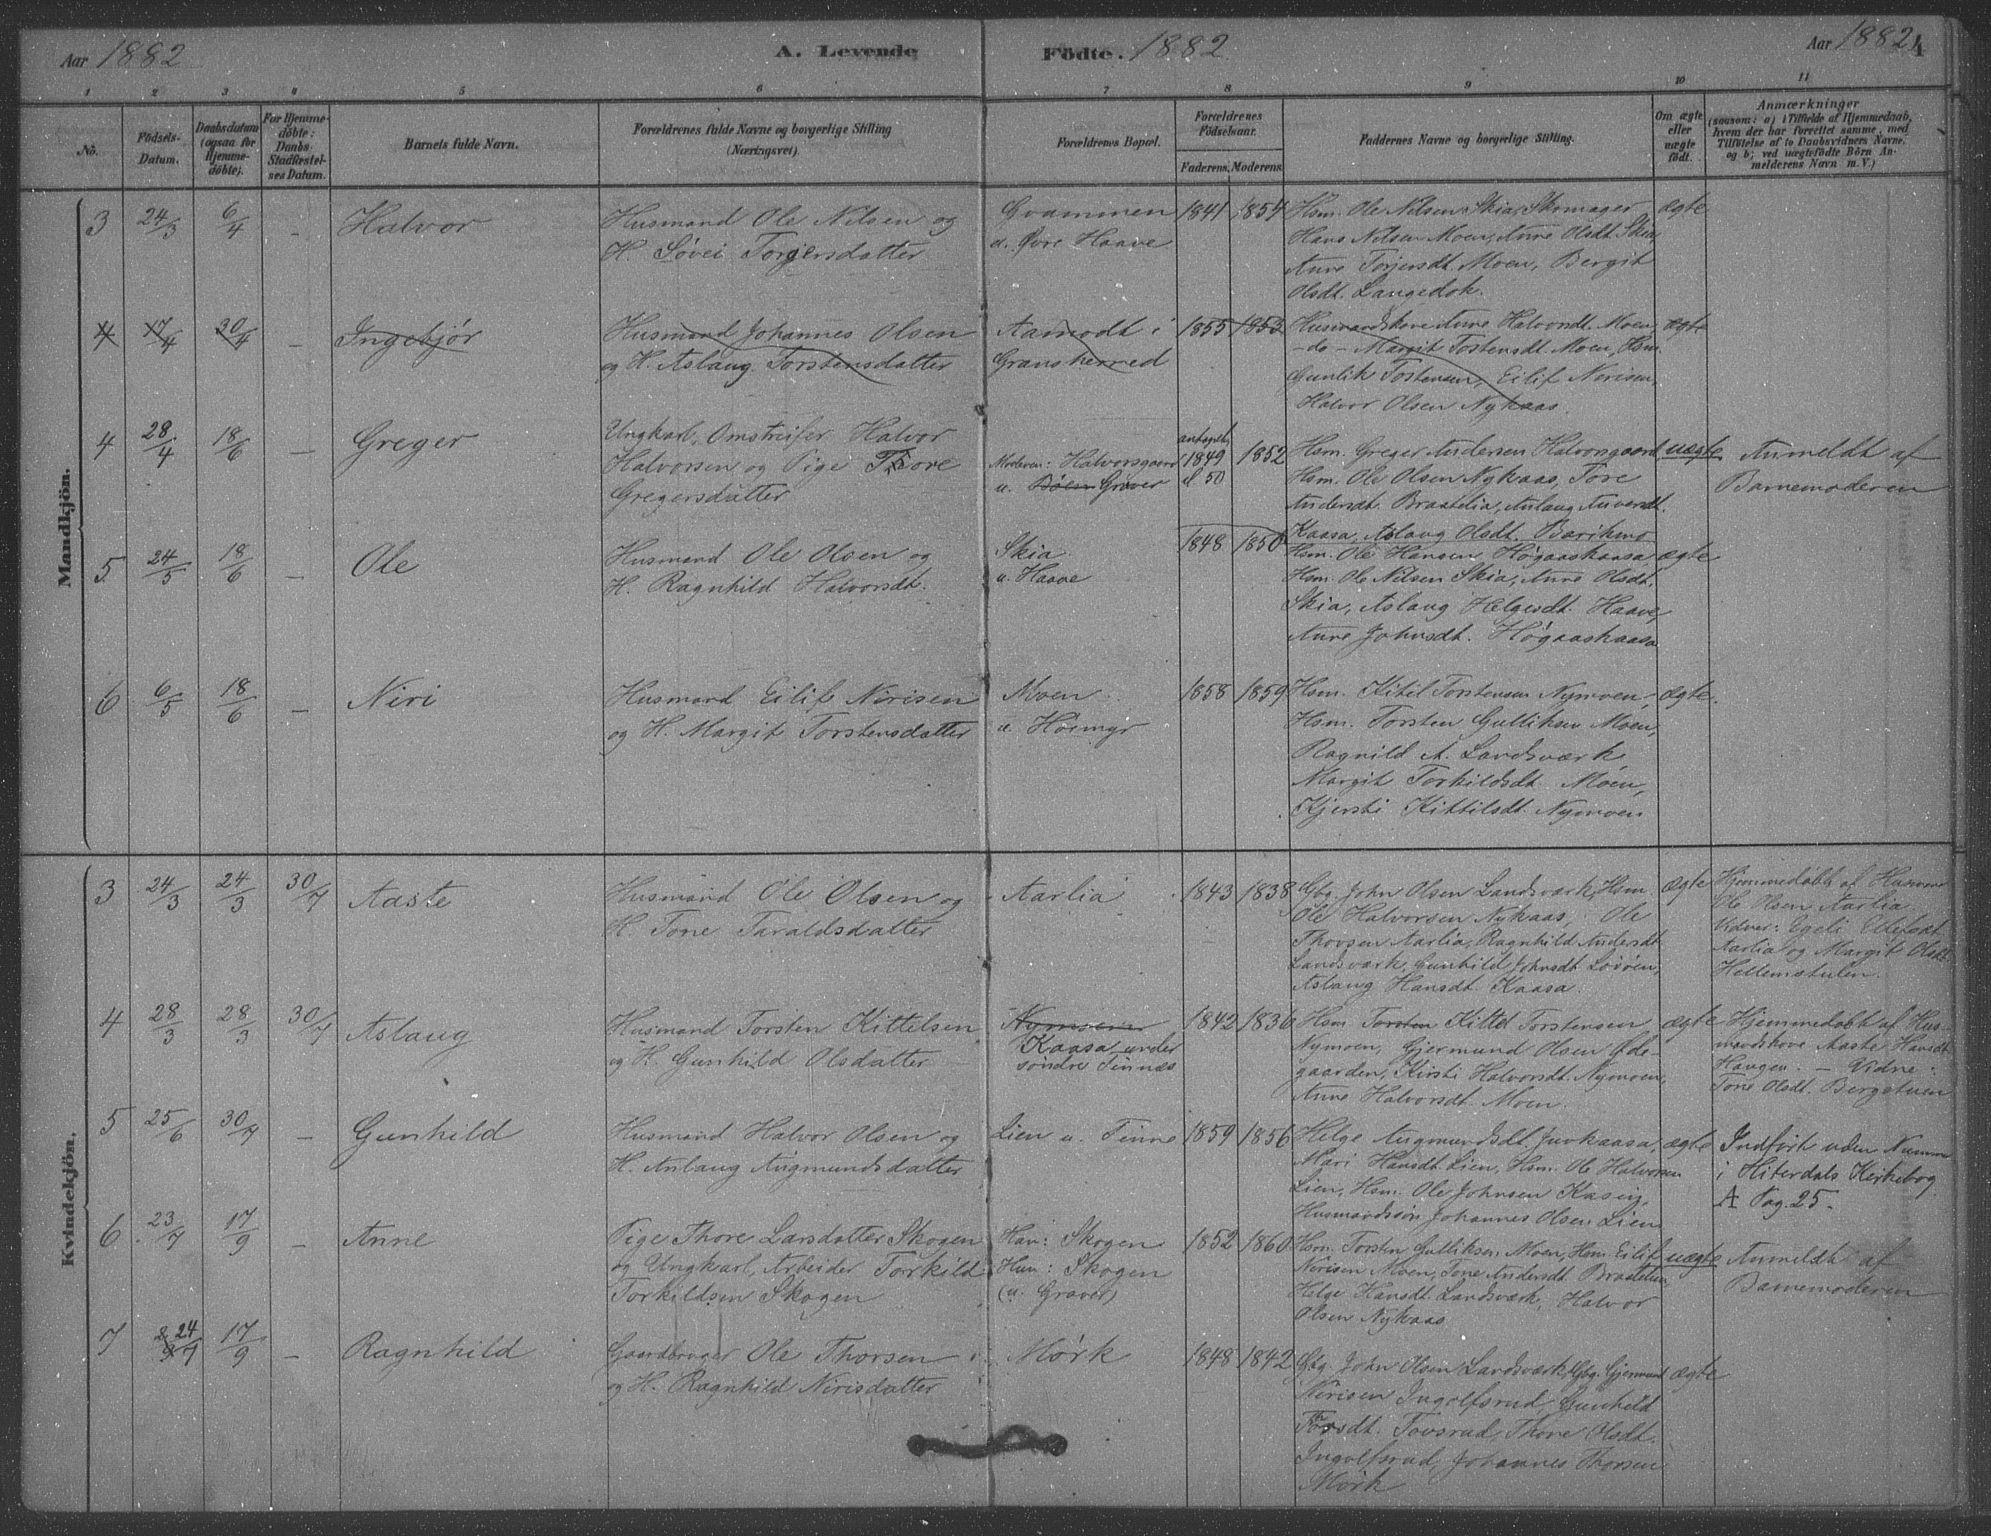 SAKO, Heddal kirkebøker, F/Fb/L0002: Ministerialbok nr. II 2, 1878-1913, s. 4